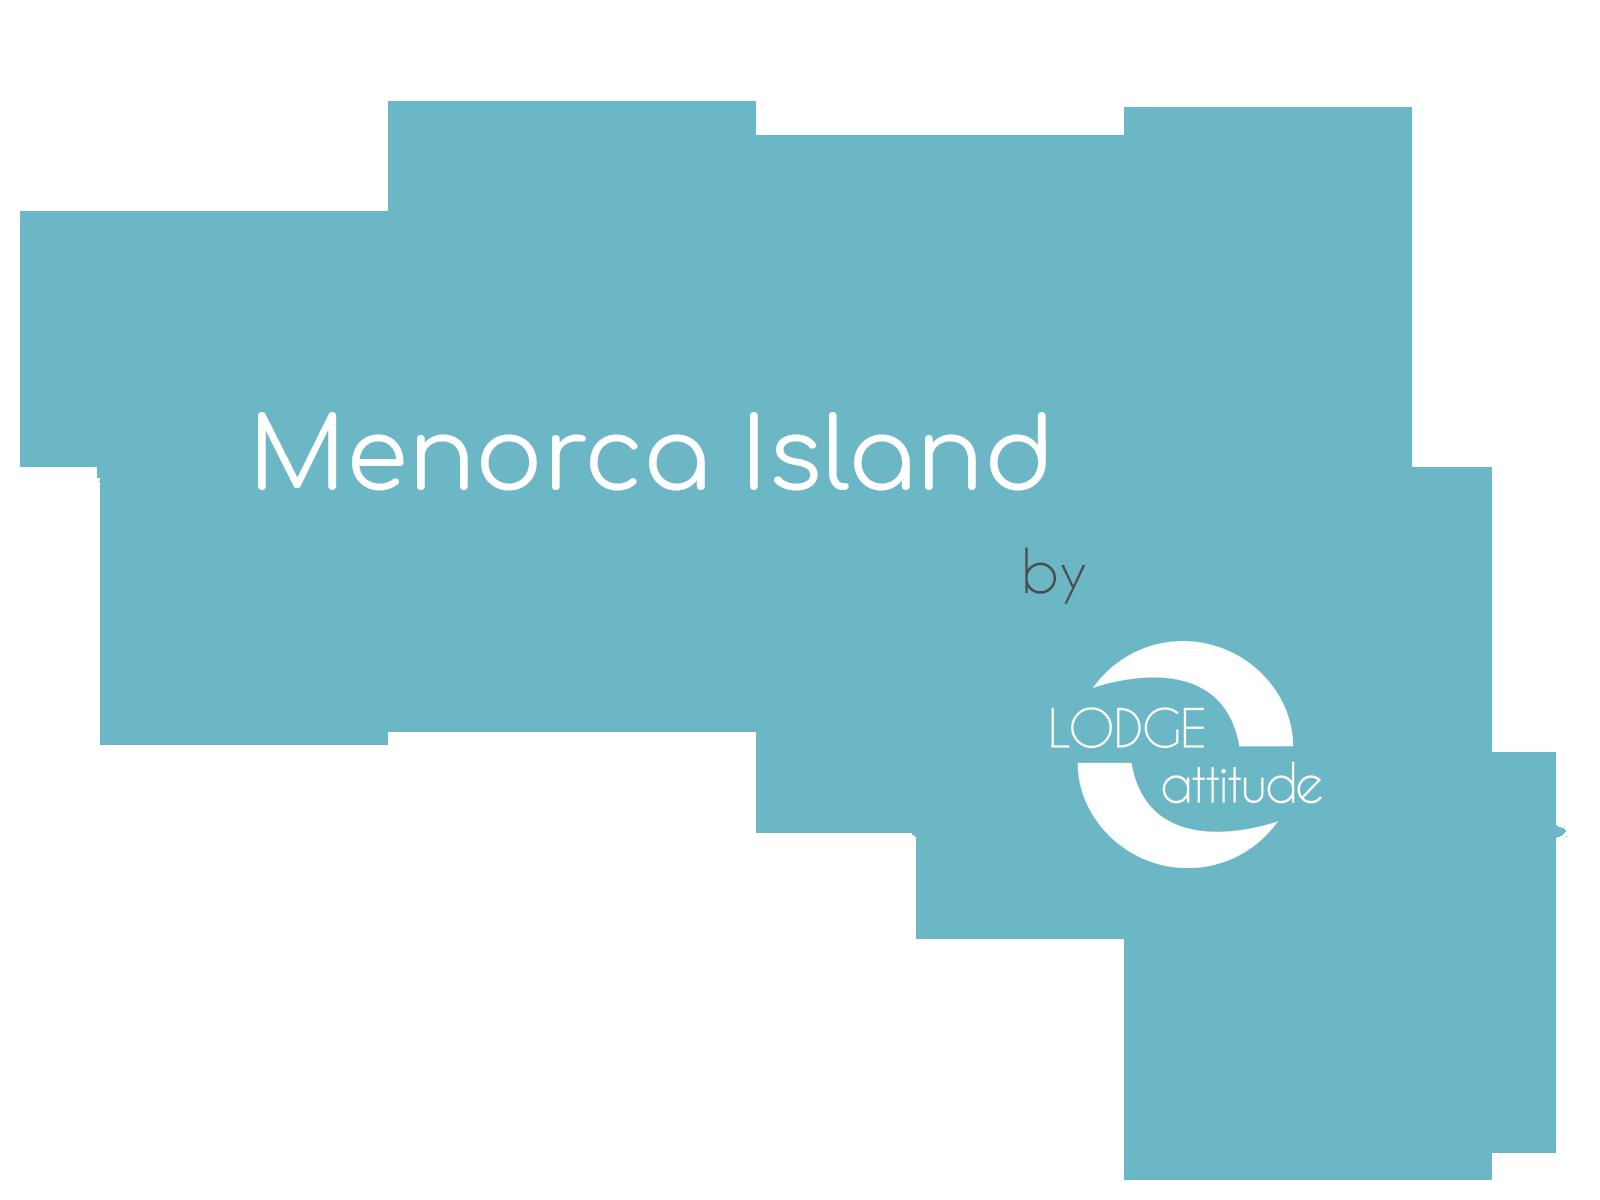 minorca island